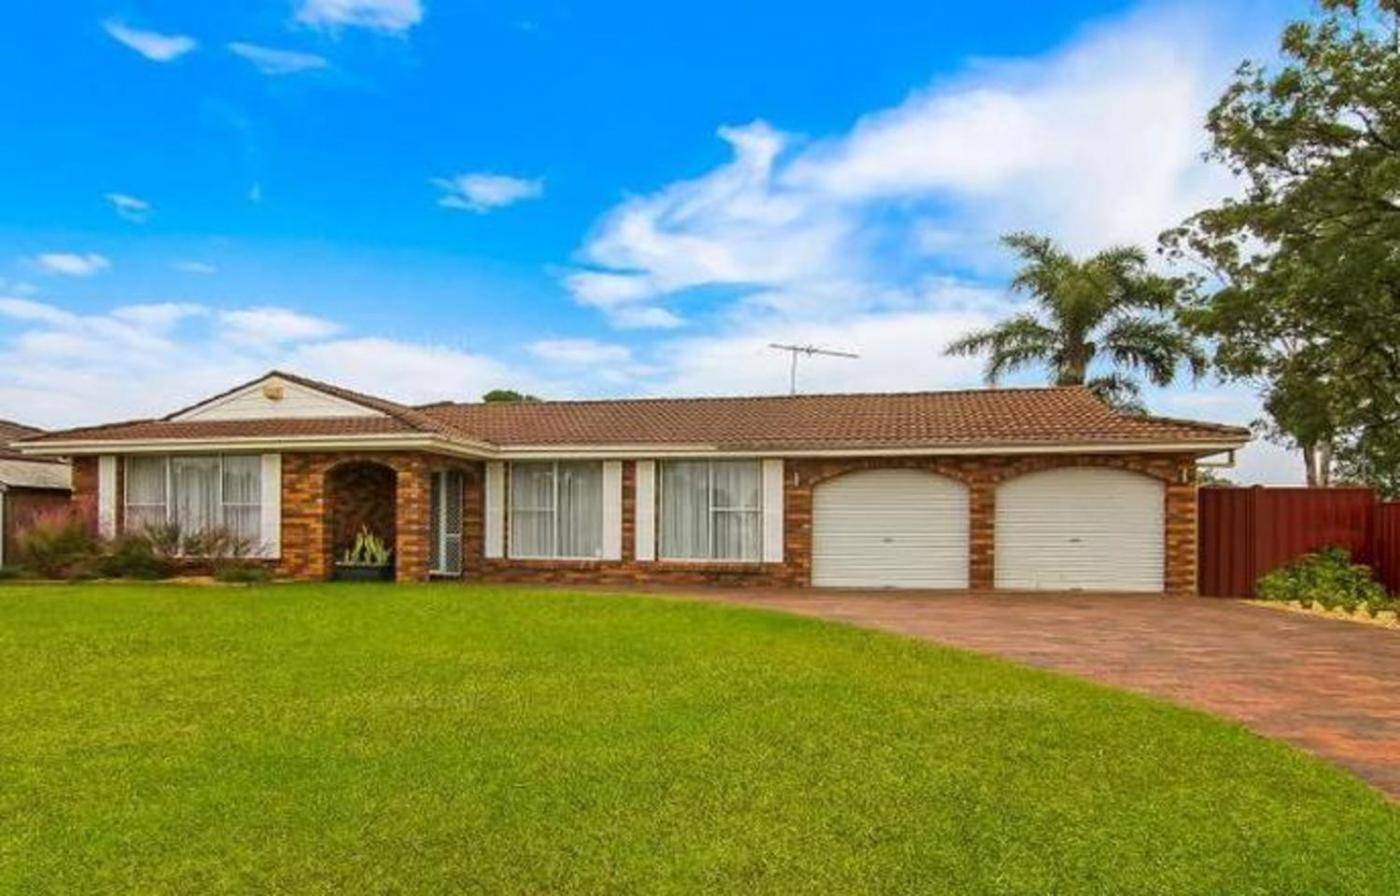 Erskine Rental Property